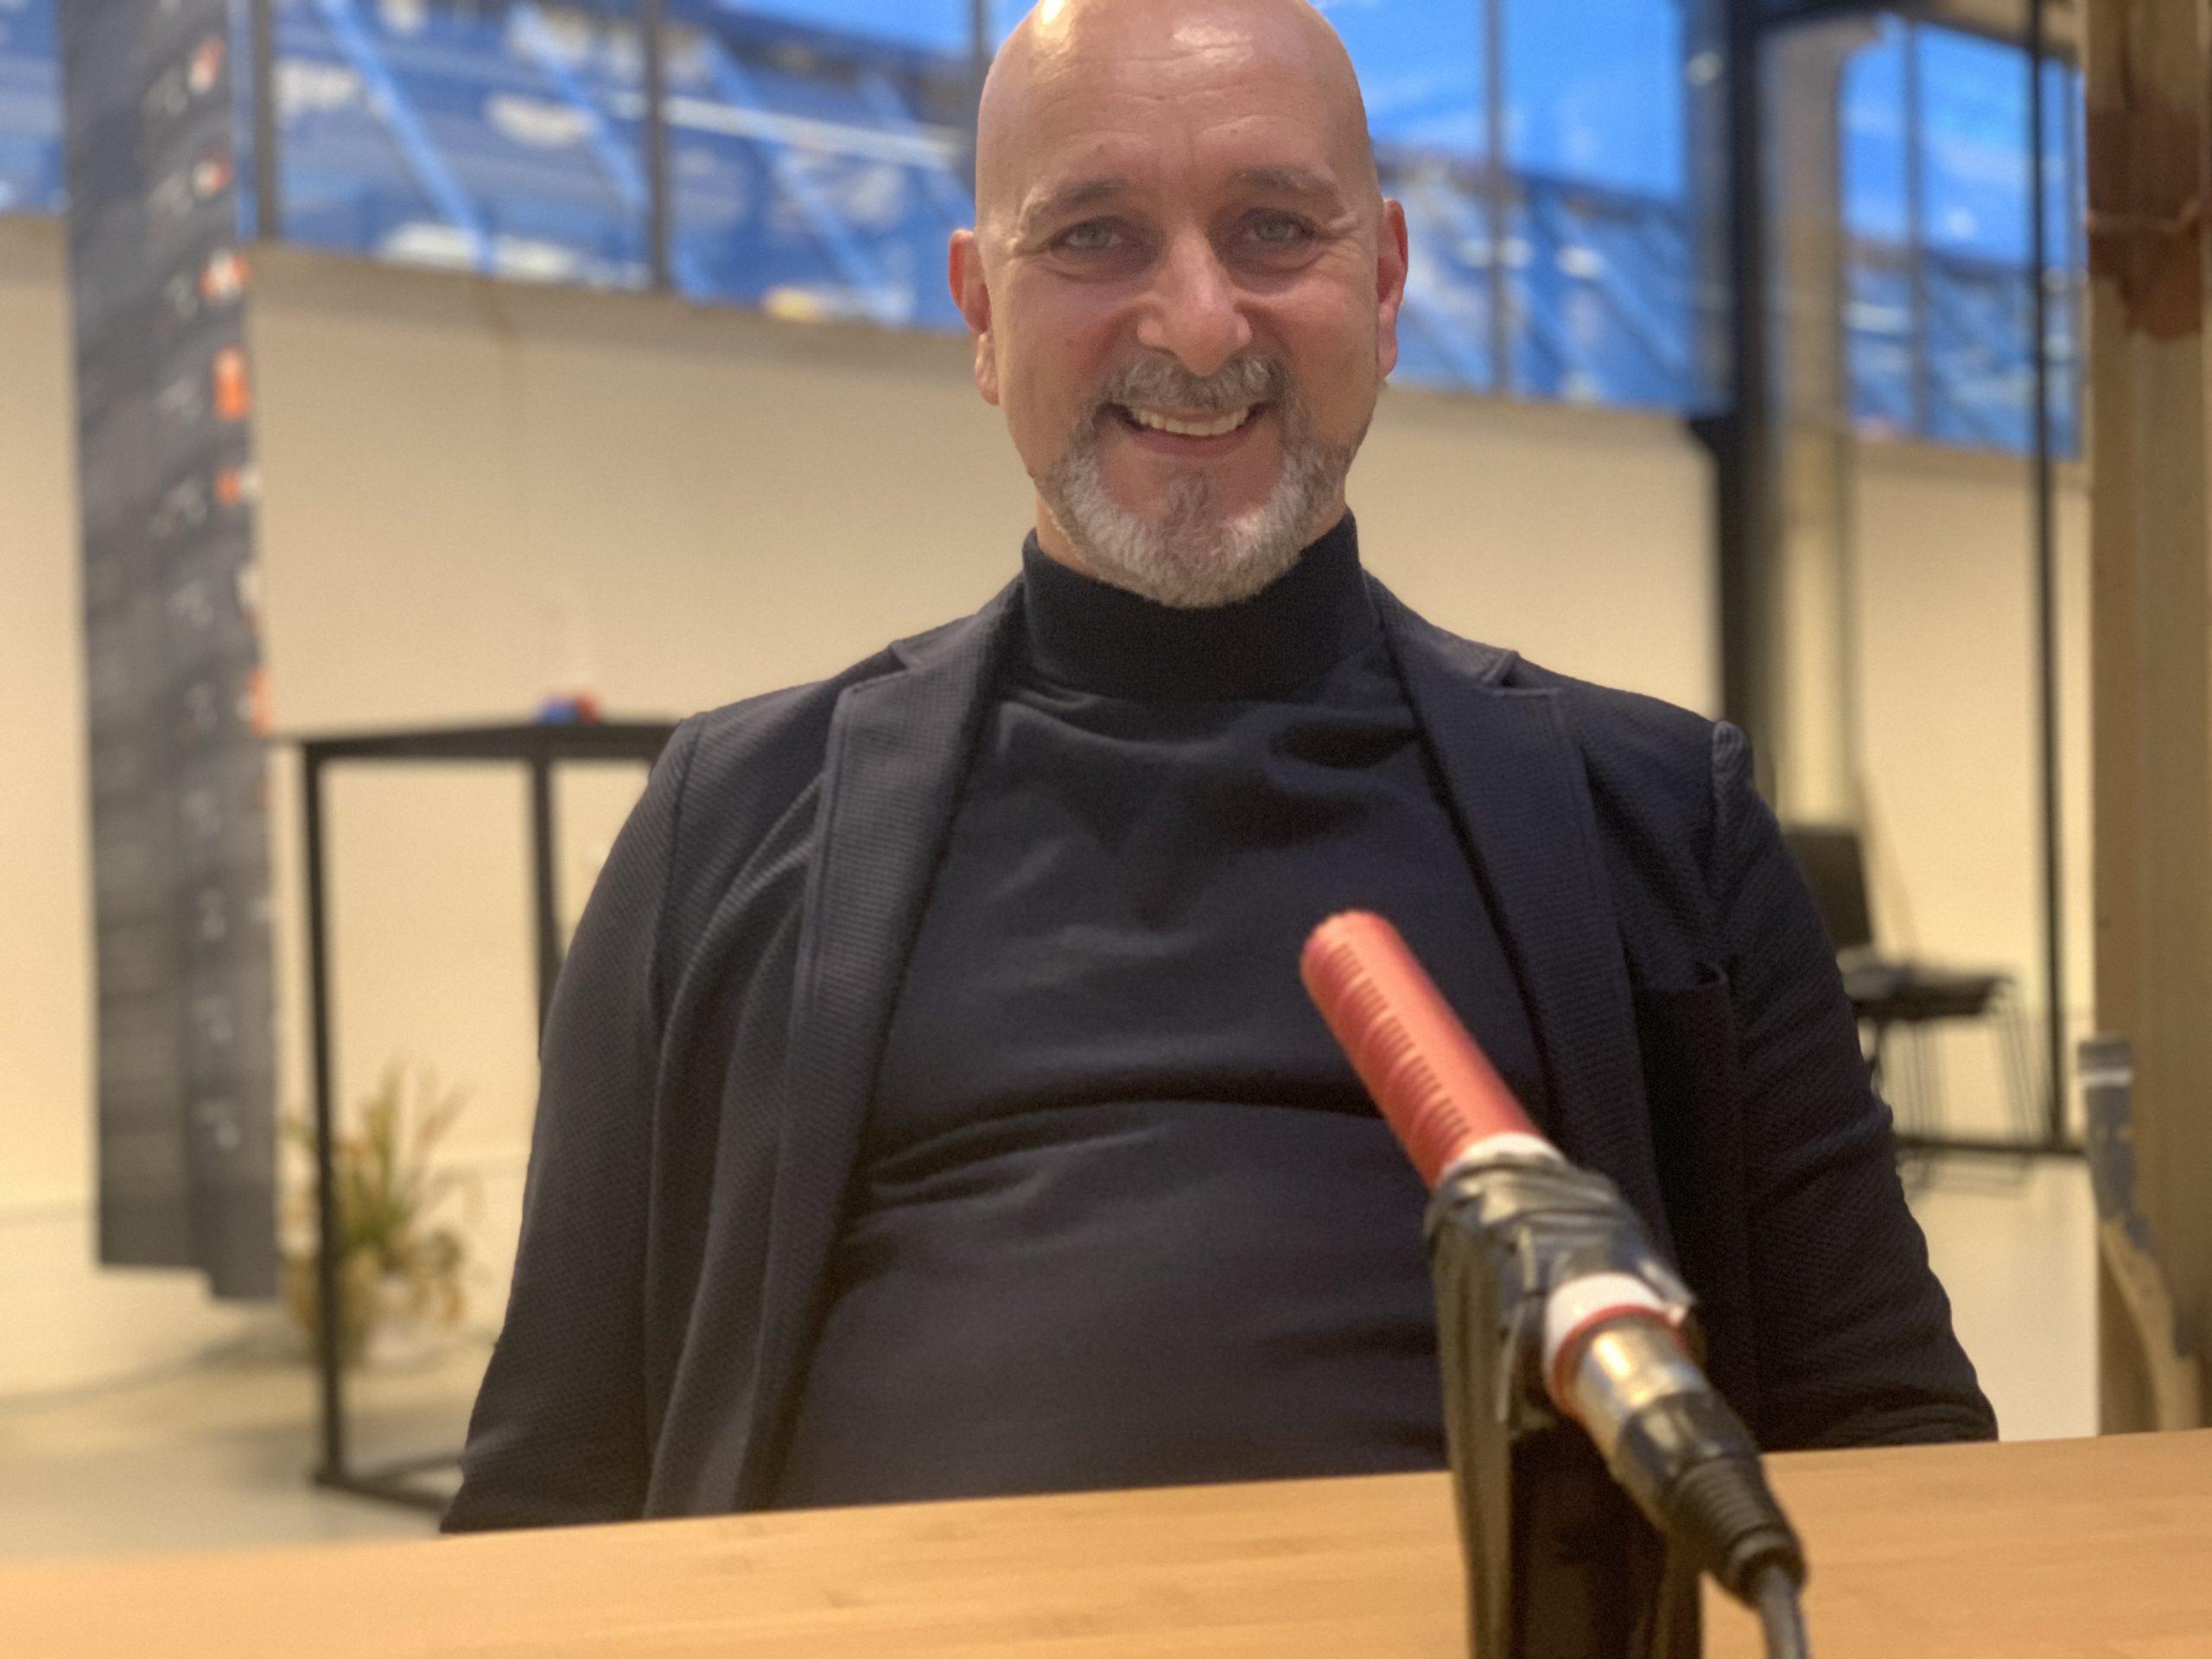 Pedro de Smit IoT Meetup